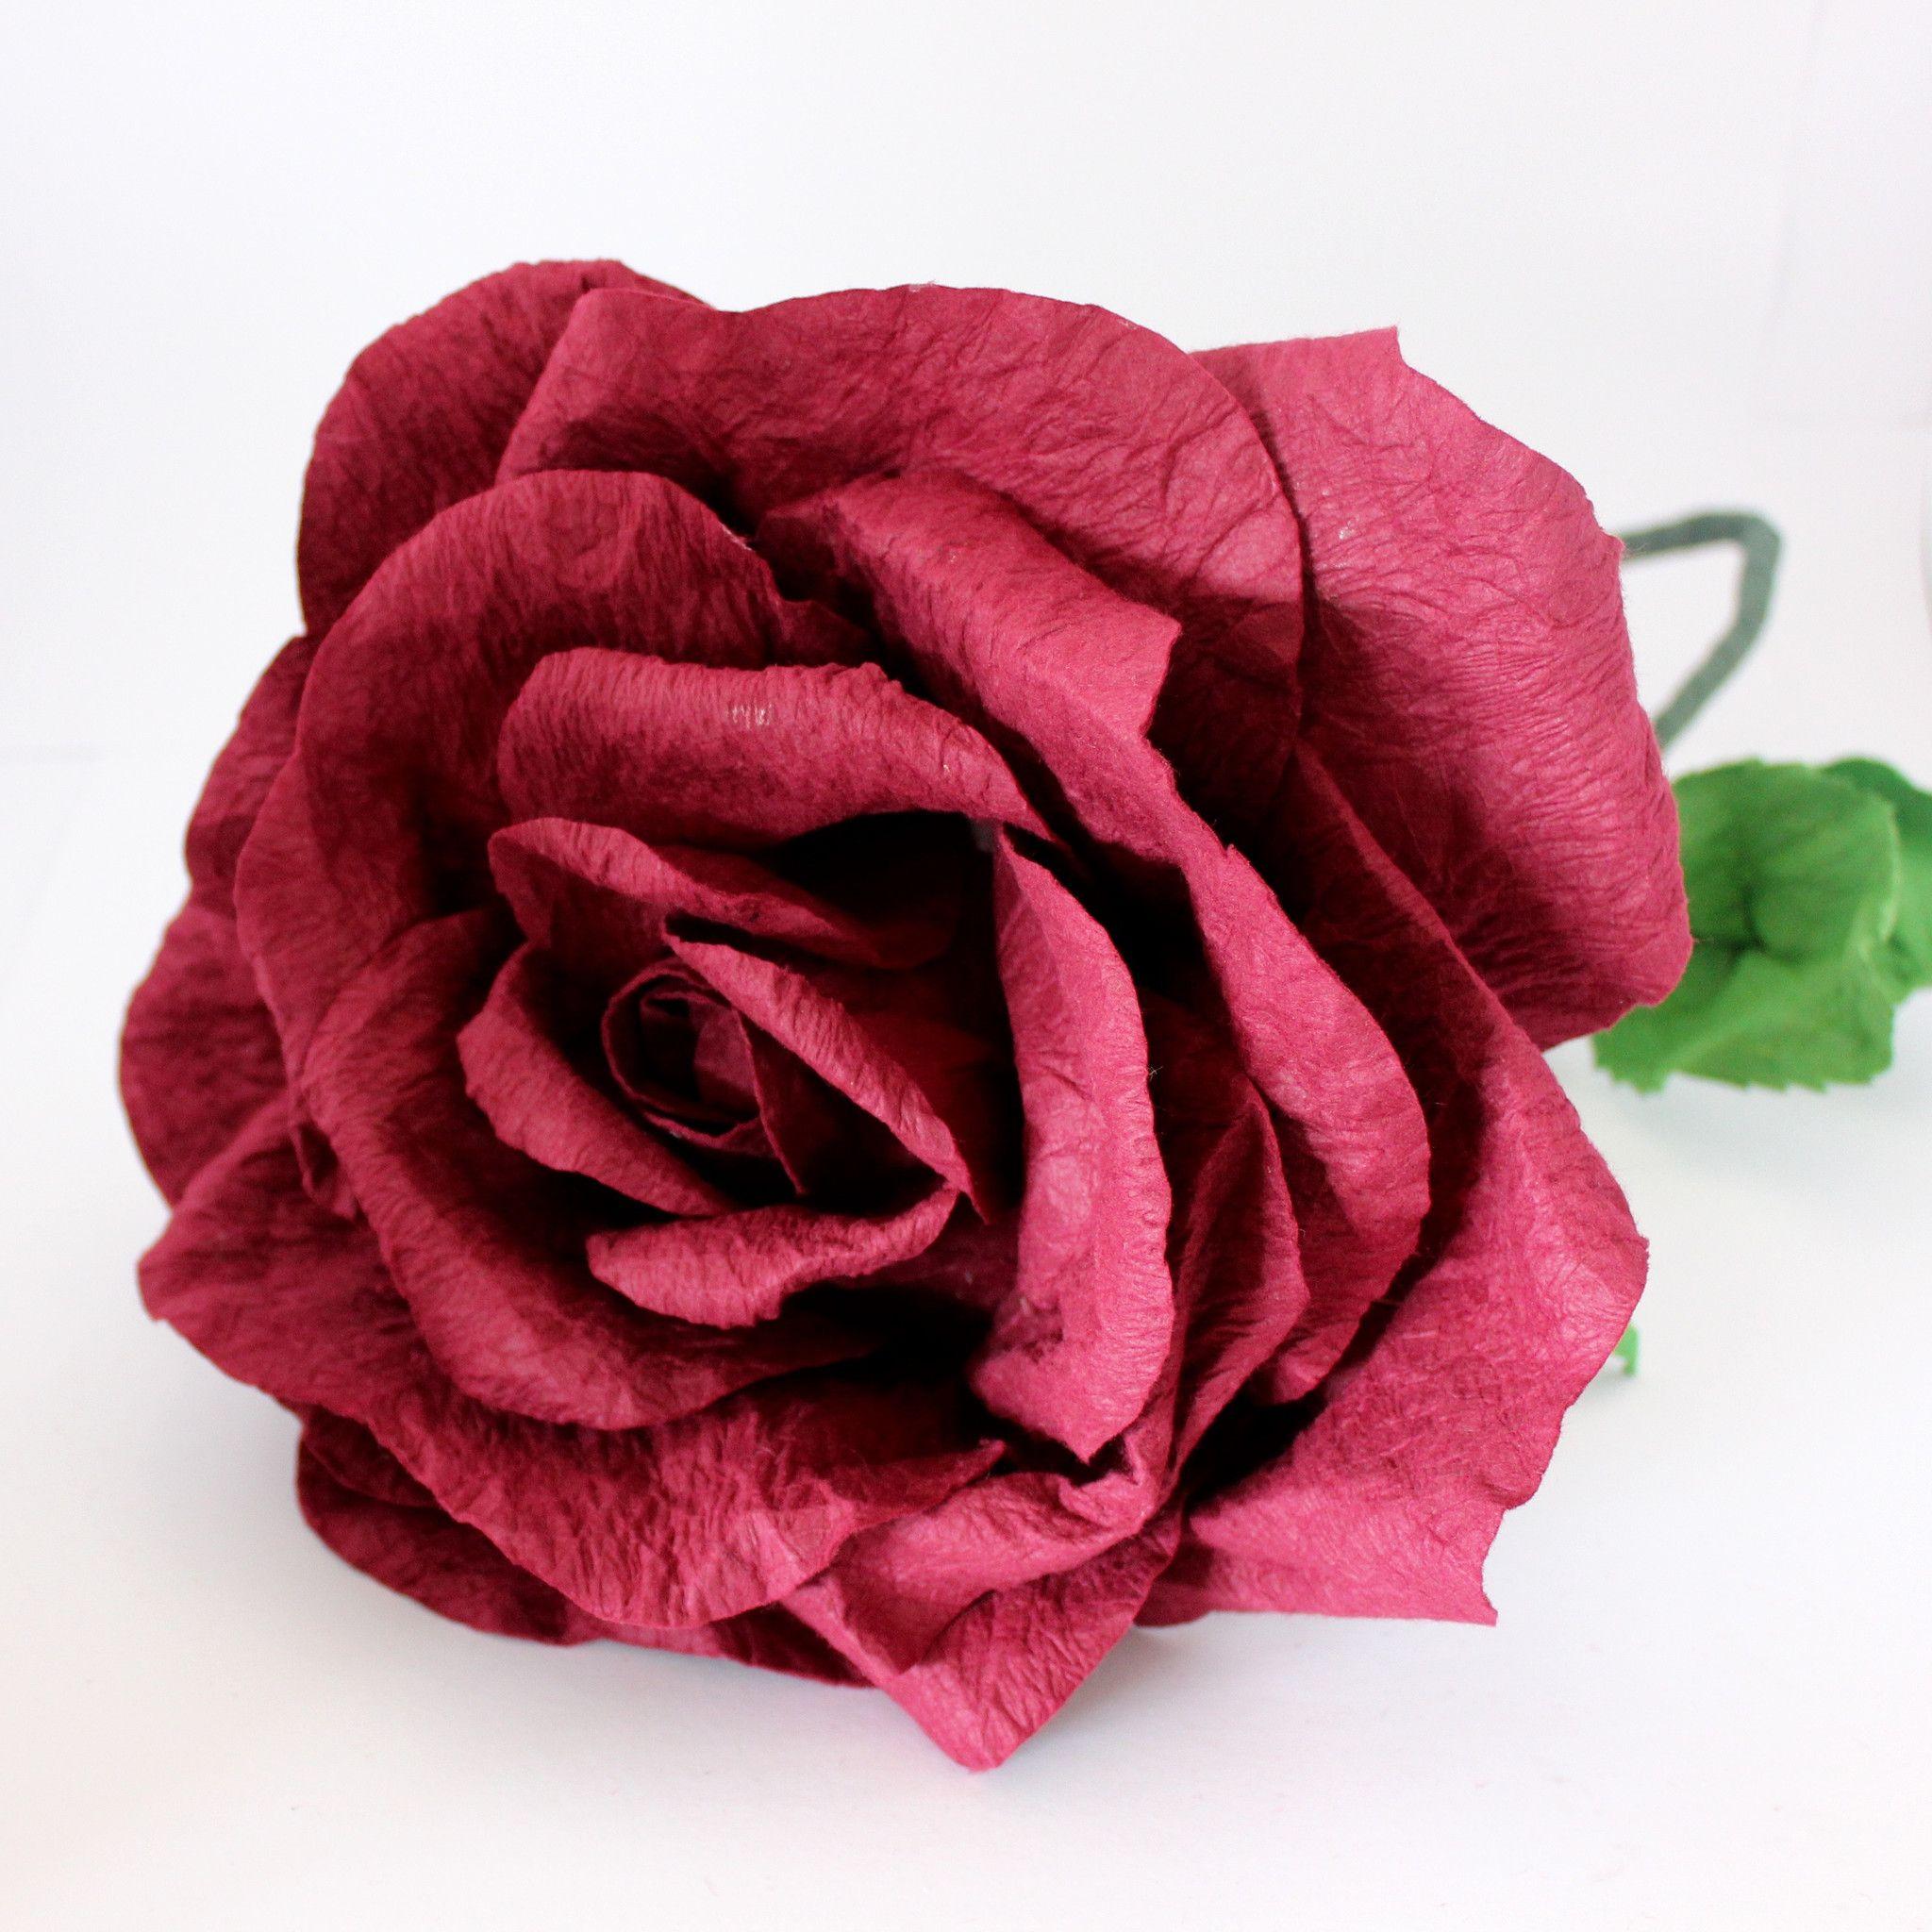 Giant stemmed rose deep red paper flowers australia paper giant stemmed rose deep red paper flowers australia mightylinksfo